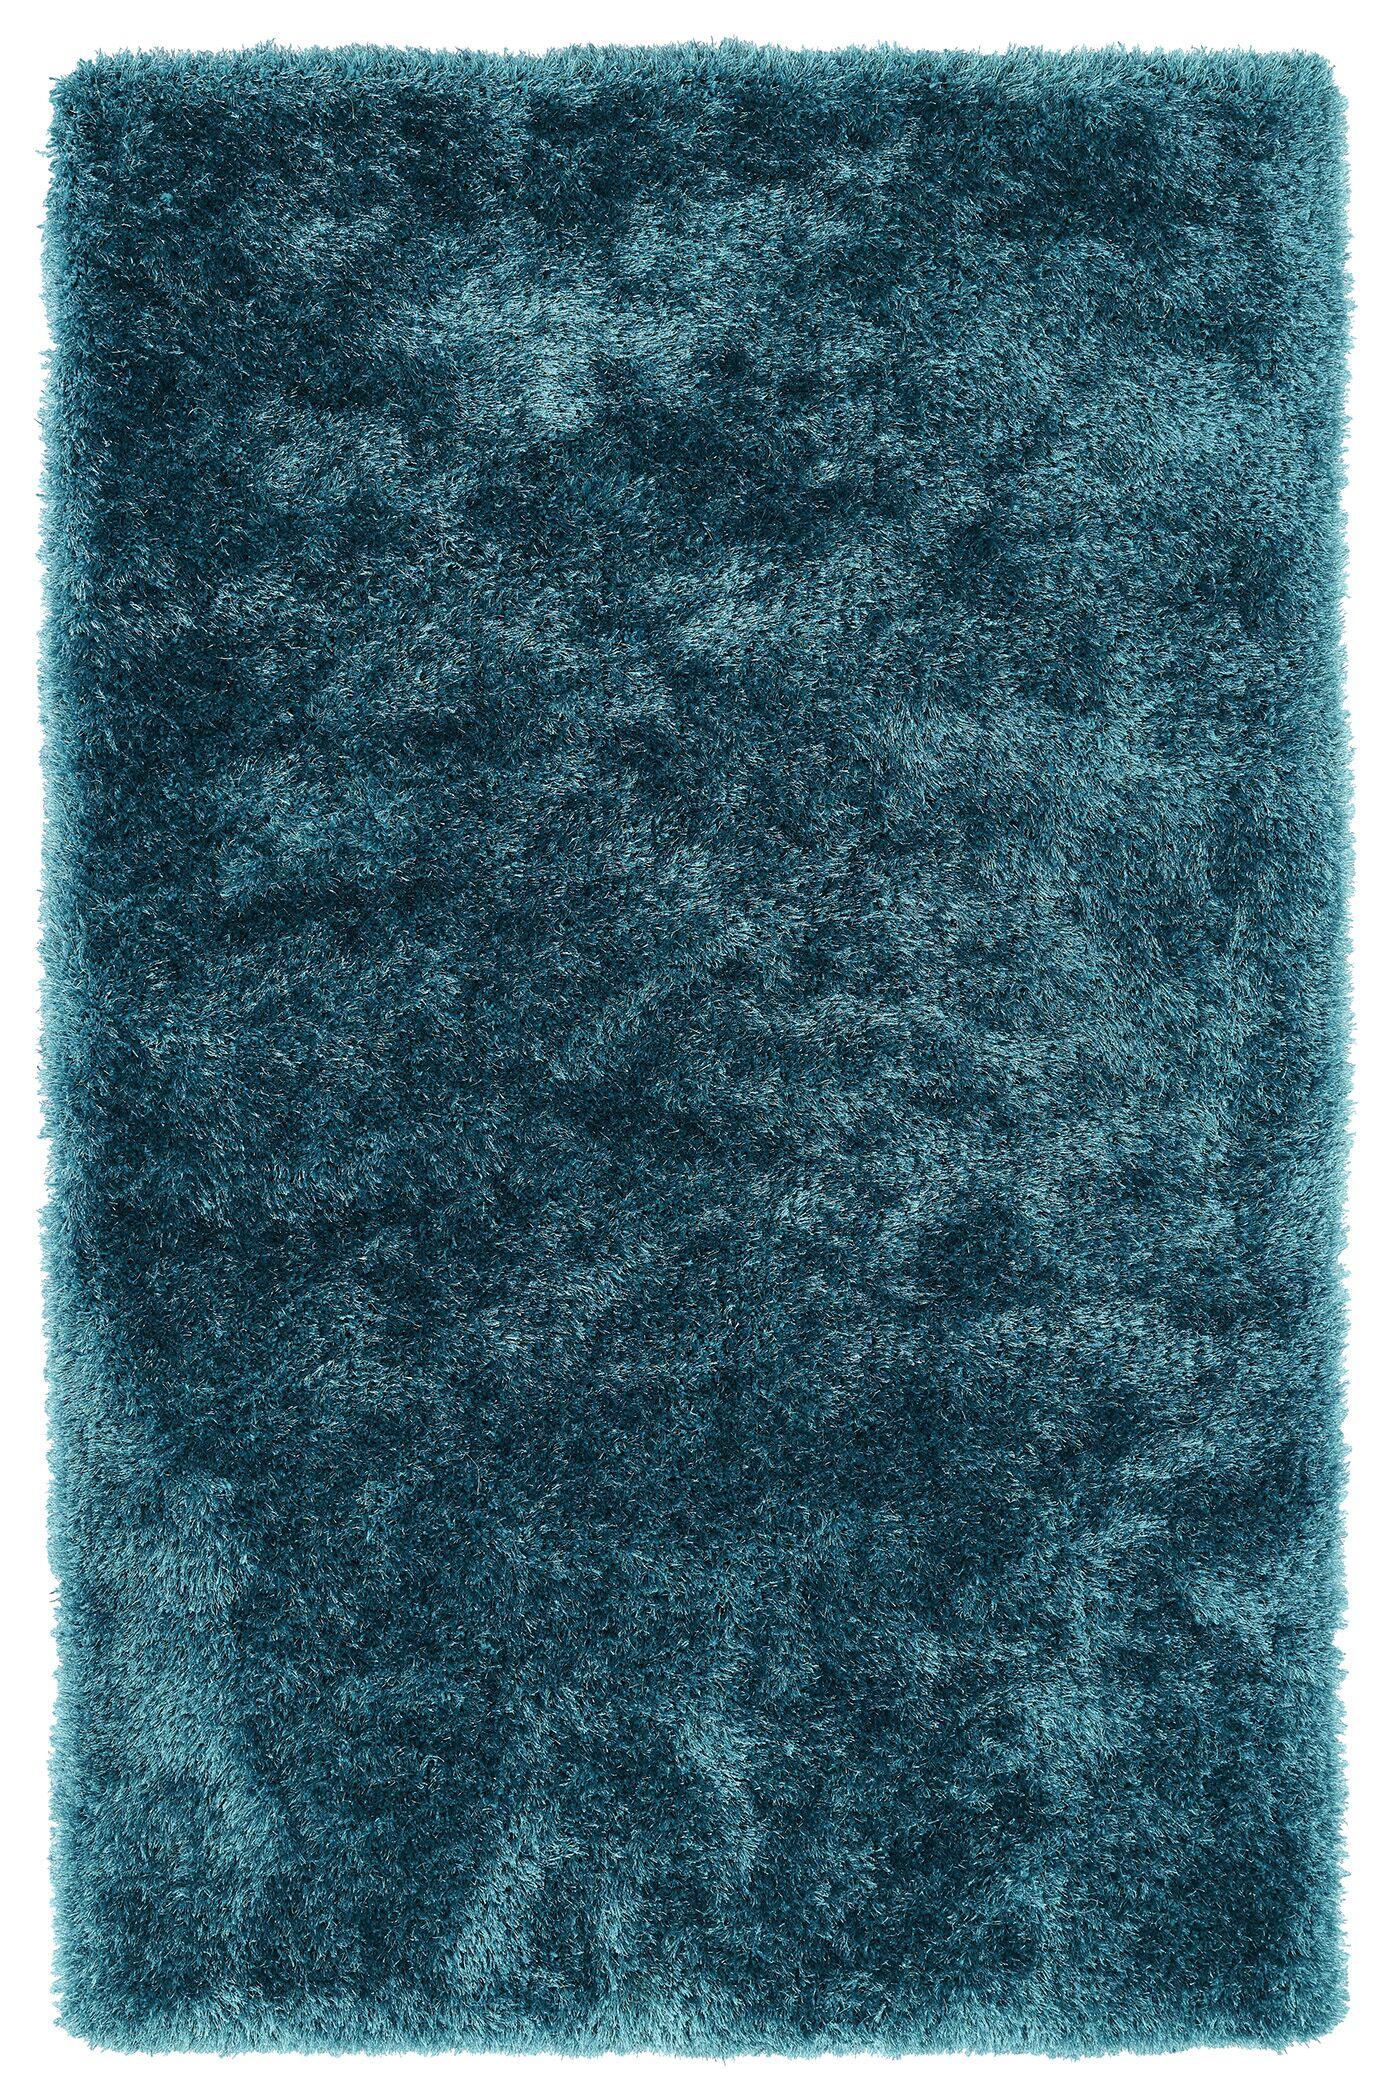 Caine Teal Area Rug Rug Size: Rectangle 3' x 5'